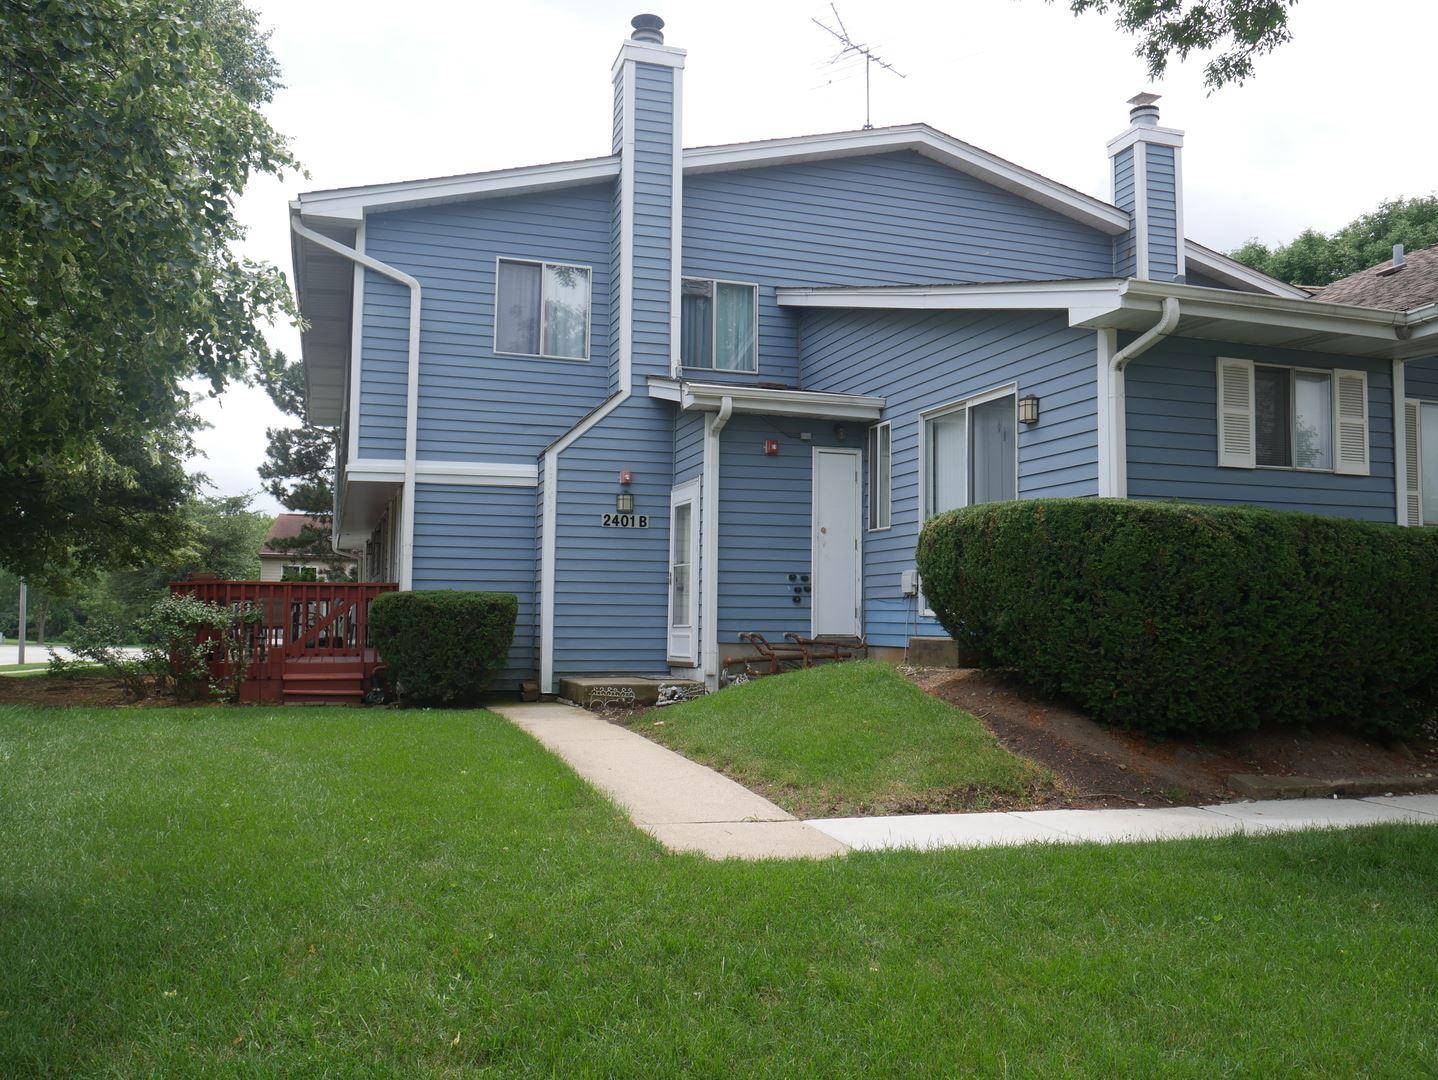 2401 Brunswick Circle #B, Woodridge, IL 60517 - #: 11203809